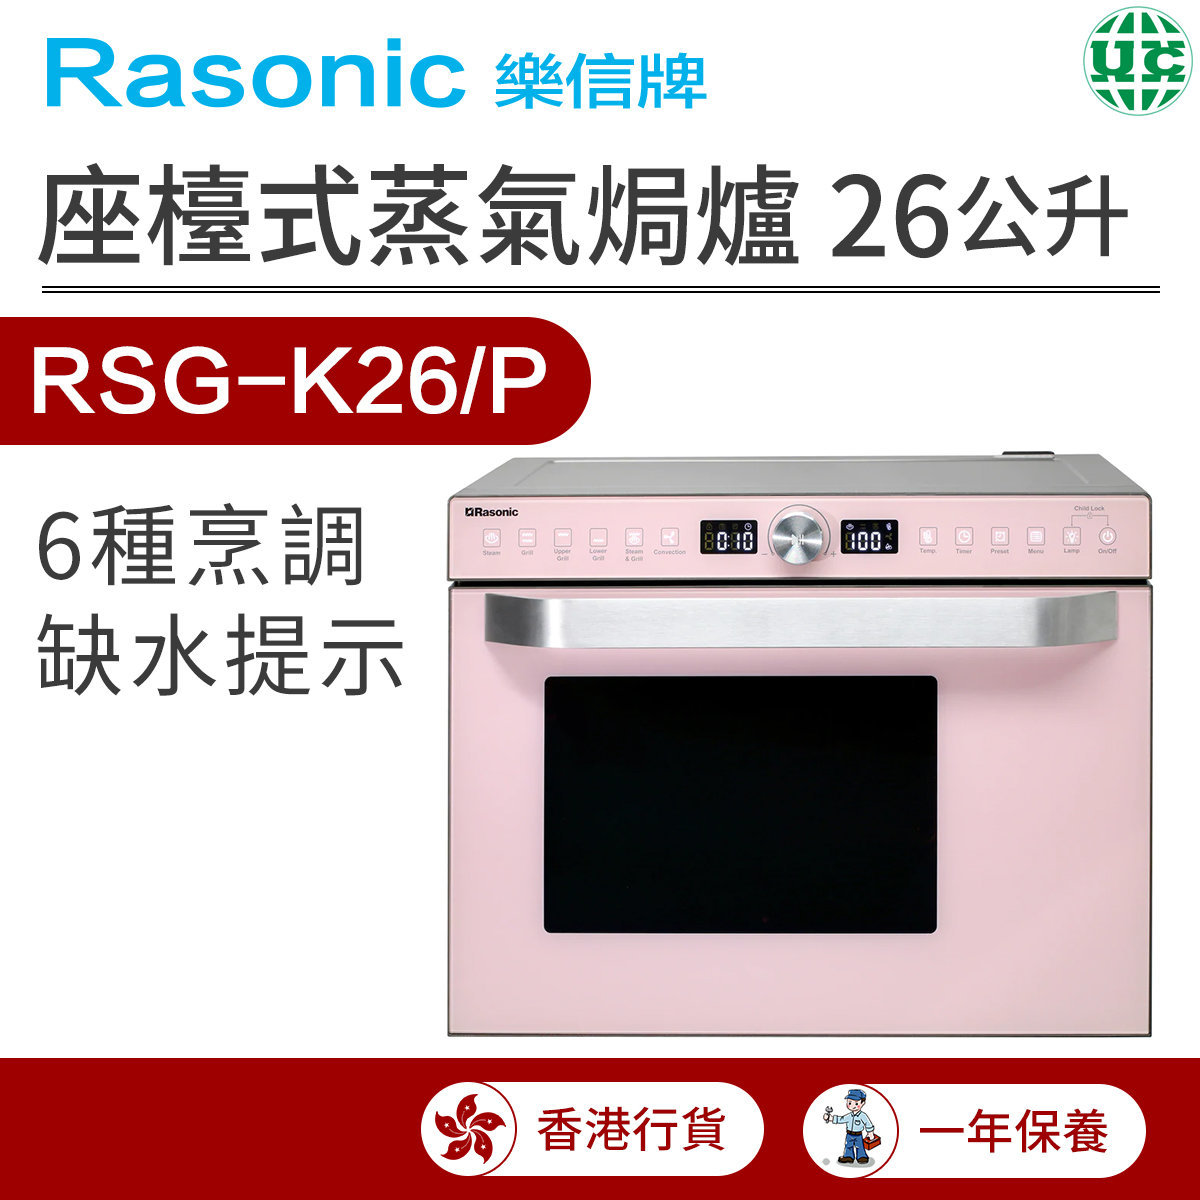 RSG-K26/P 座檯式蒸氣焗爐 26公升 (香港行貨)